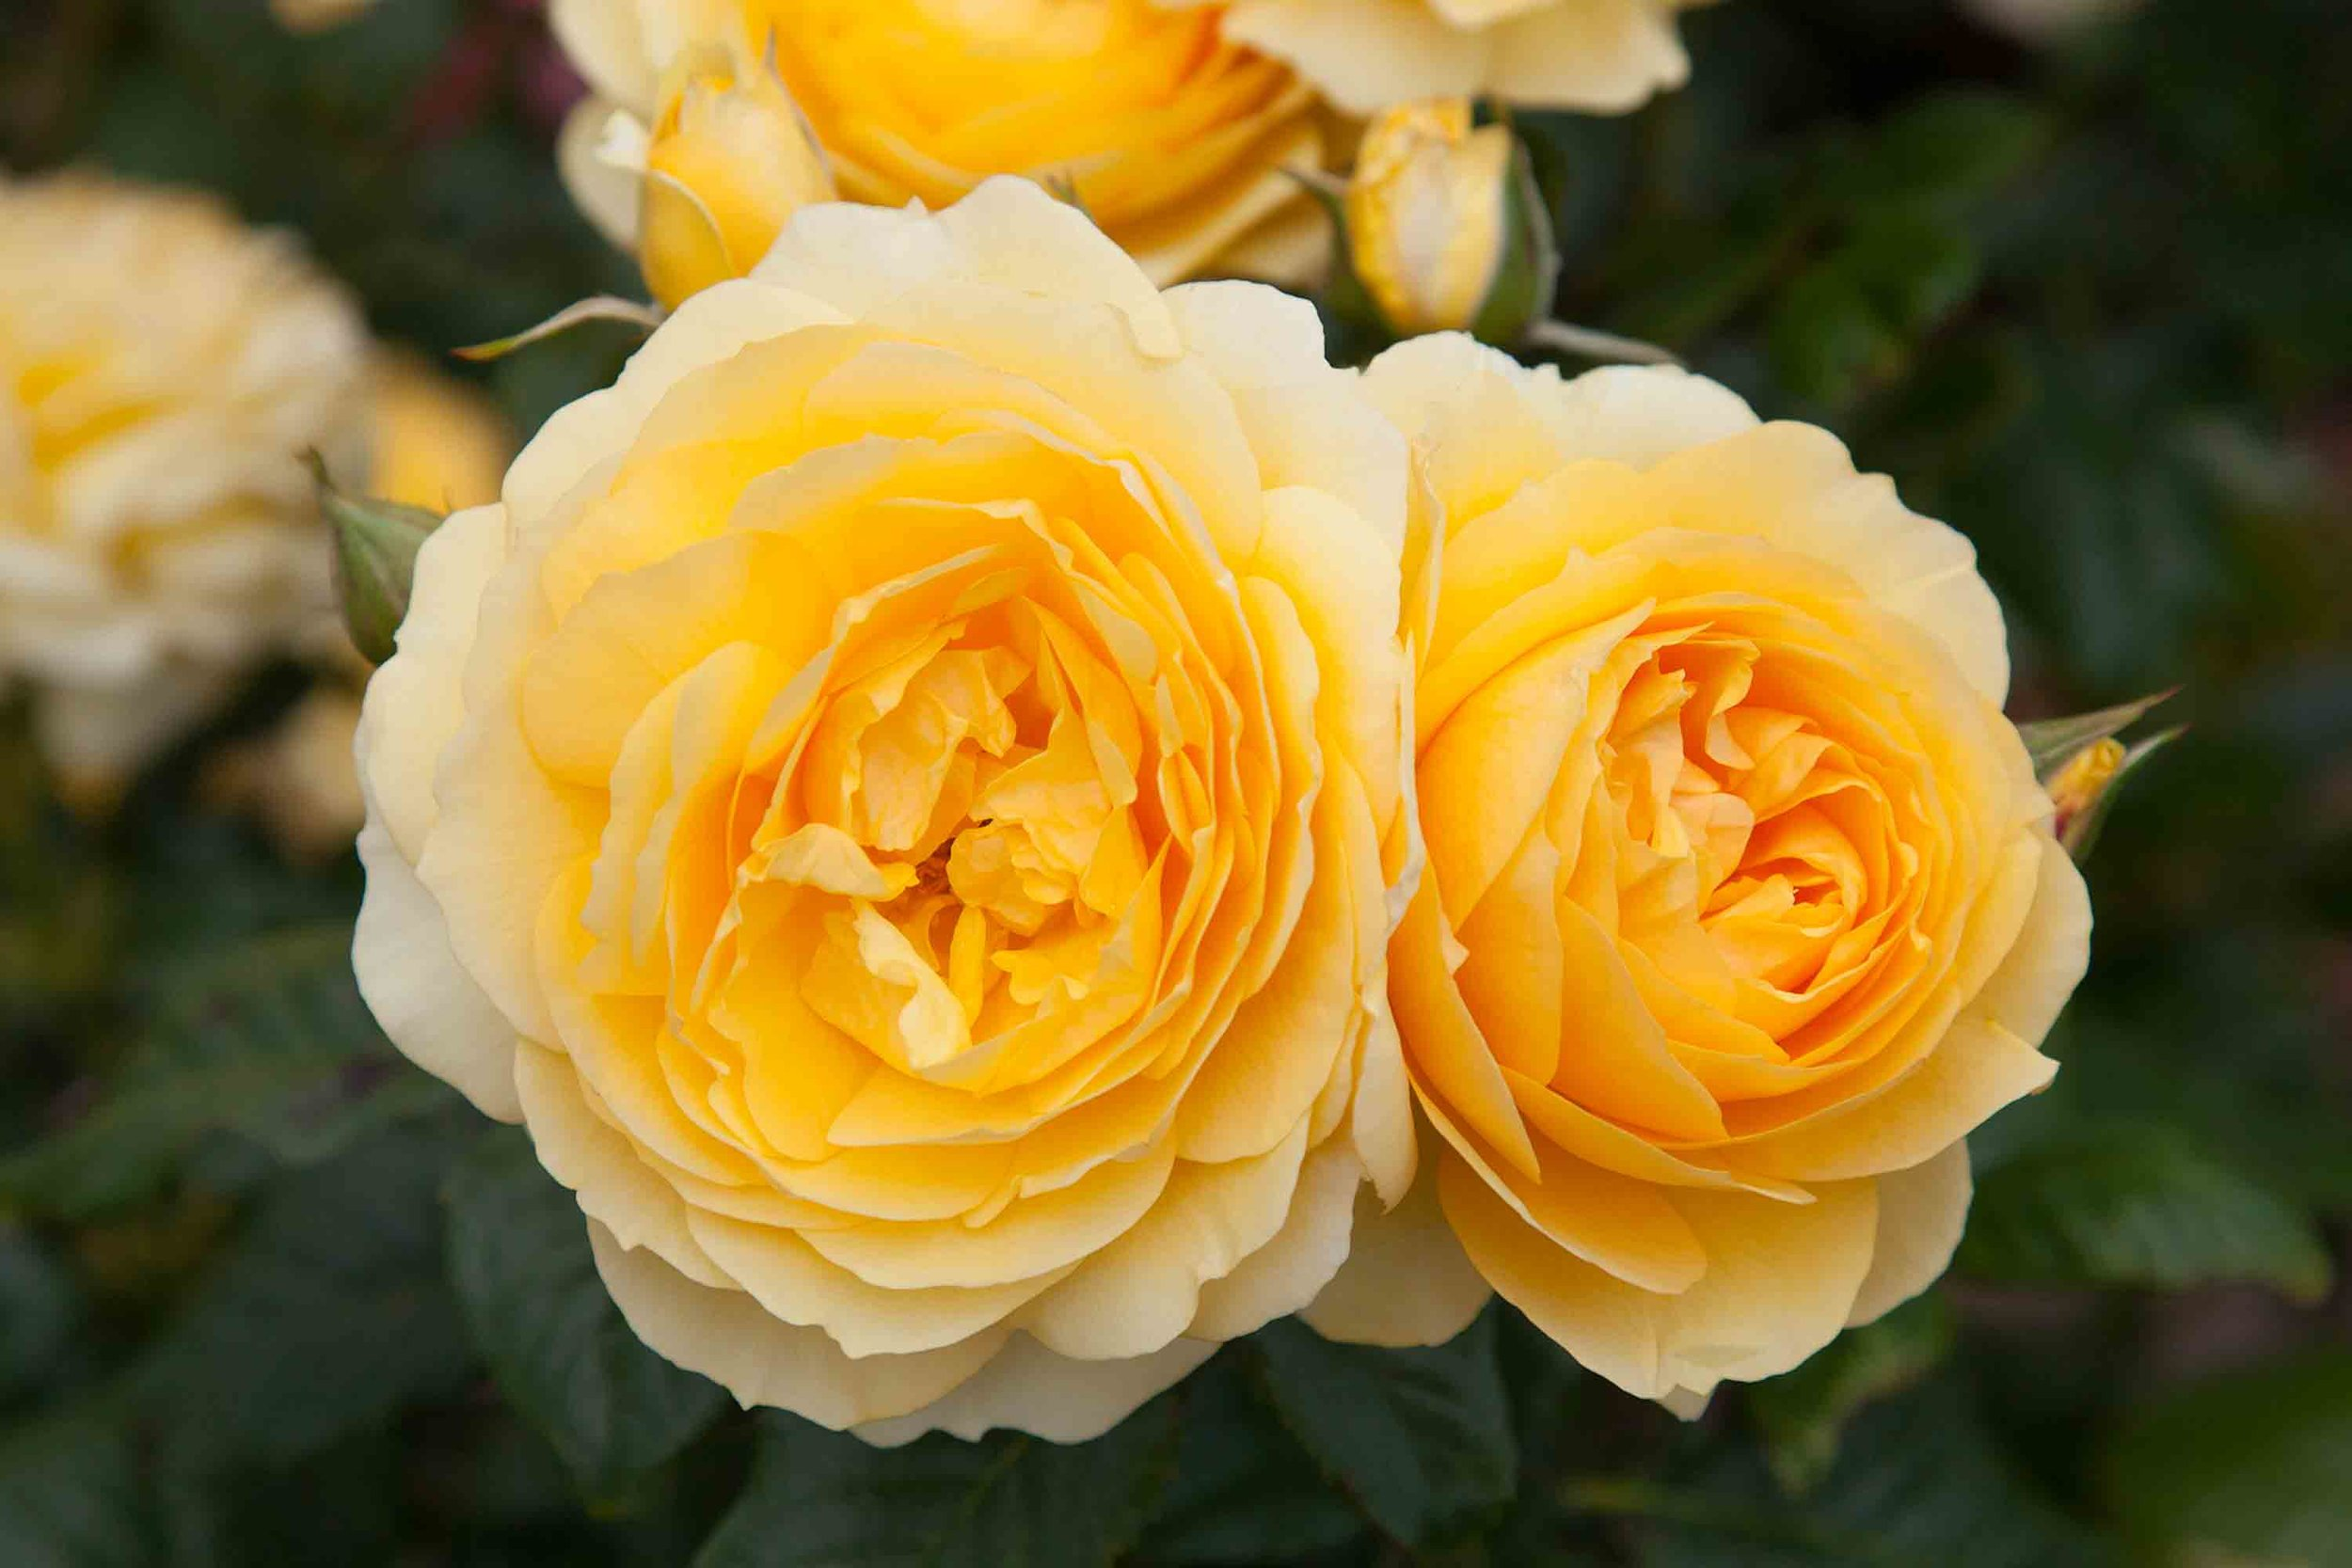 roses-reduced-11.jpg